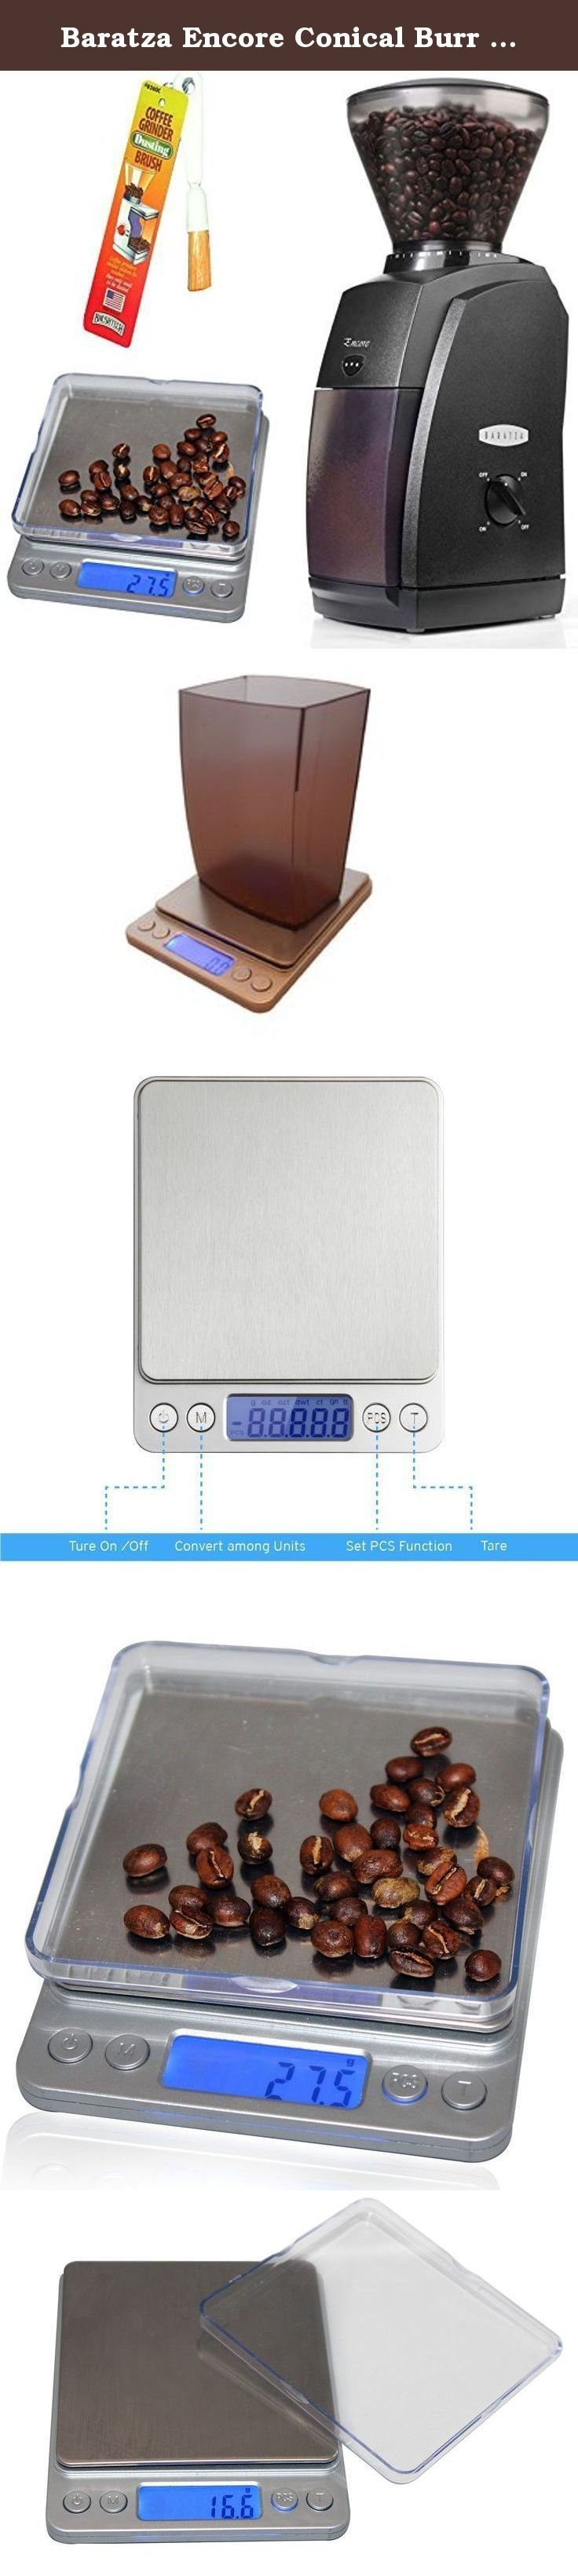 17 best ideas about digital kitchen scales on pinterest | good